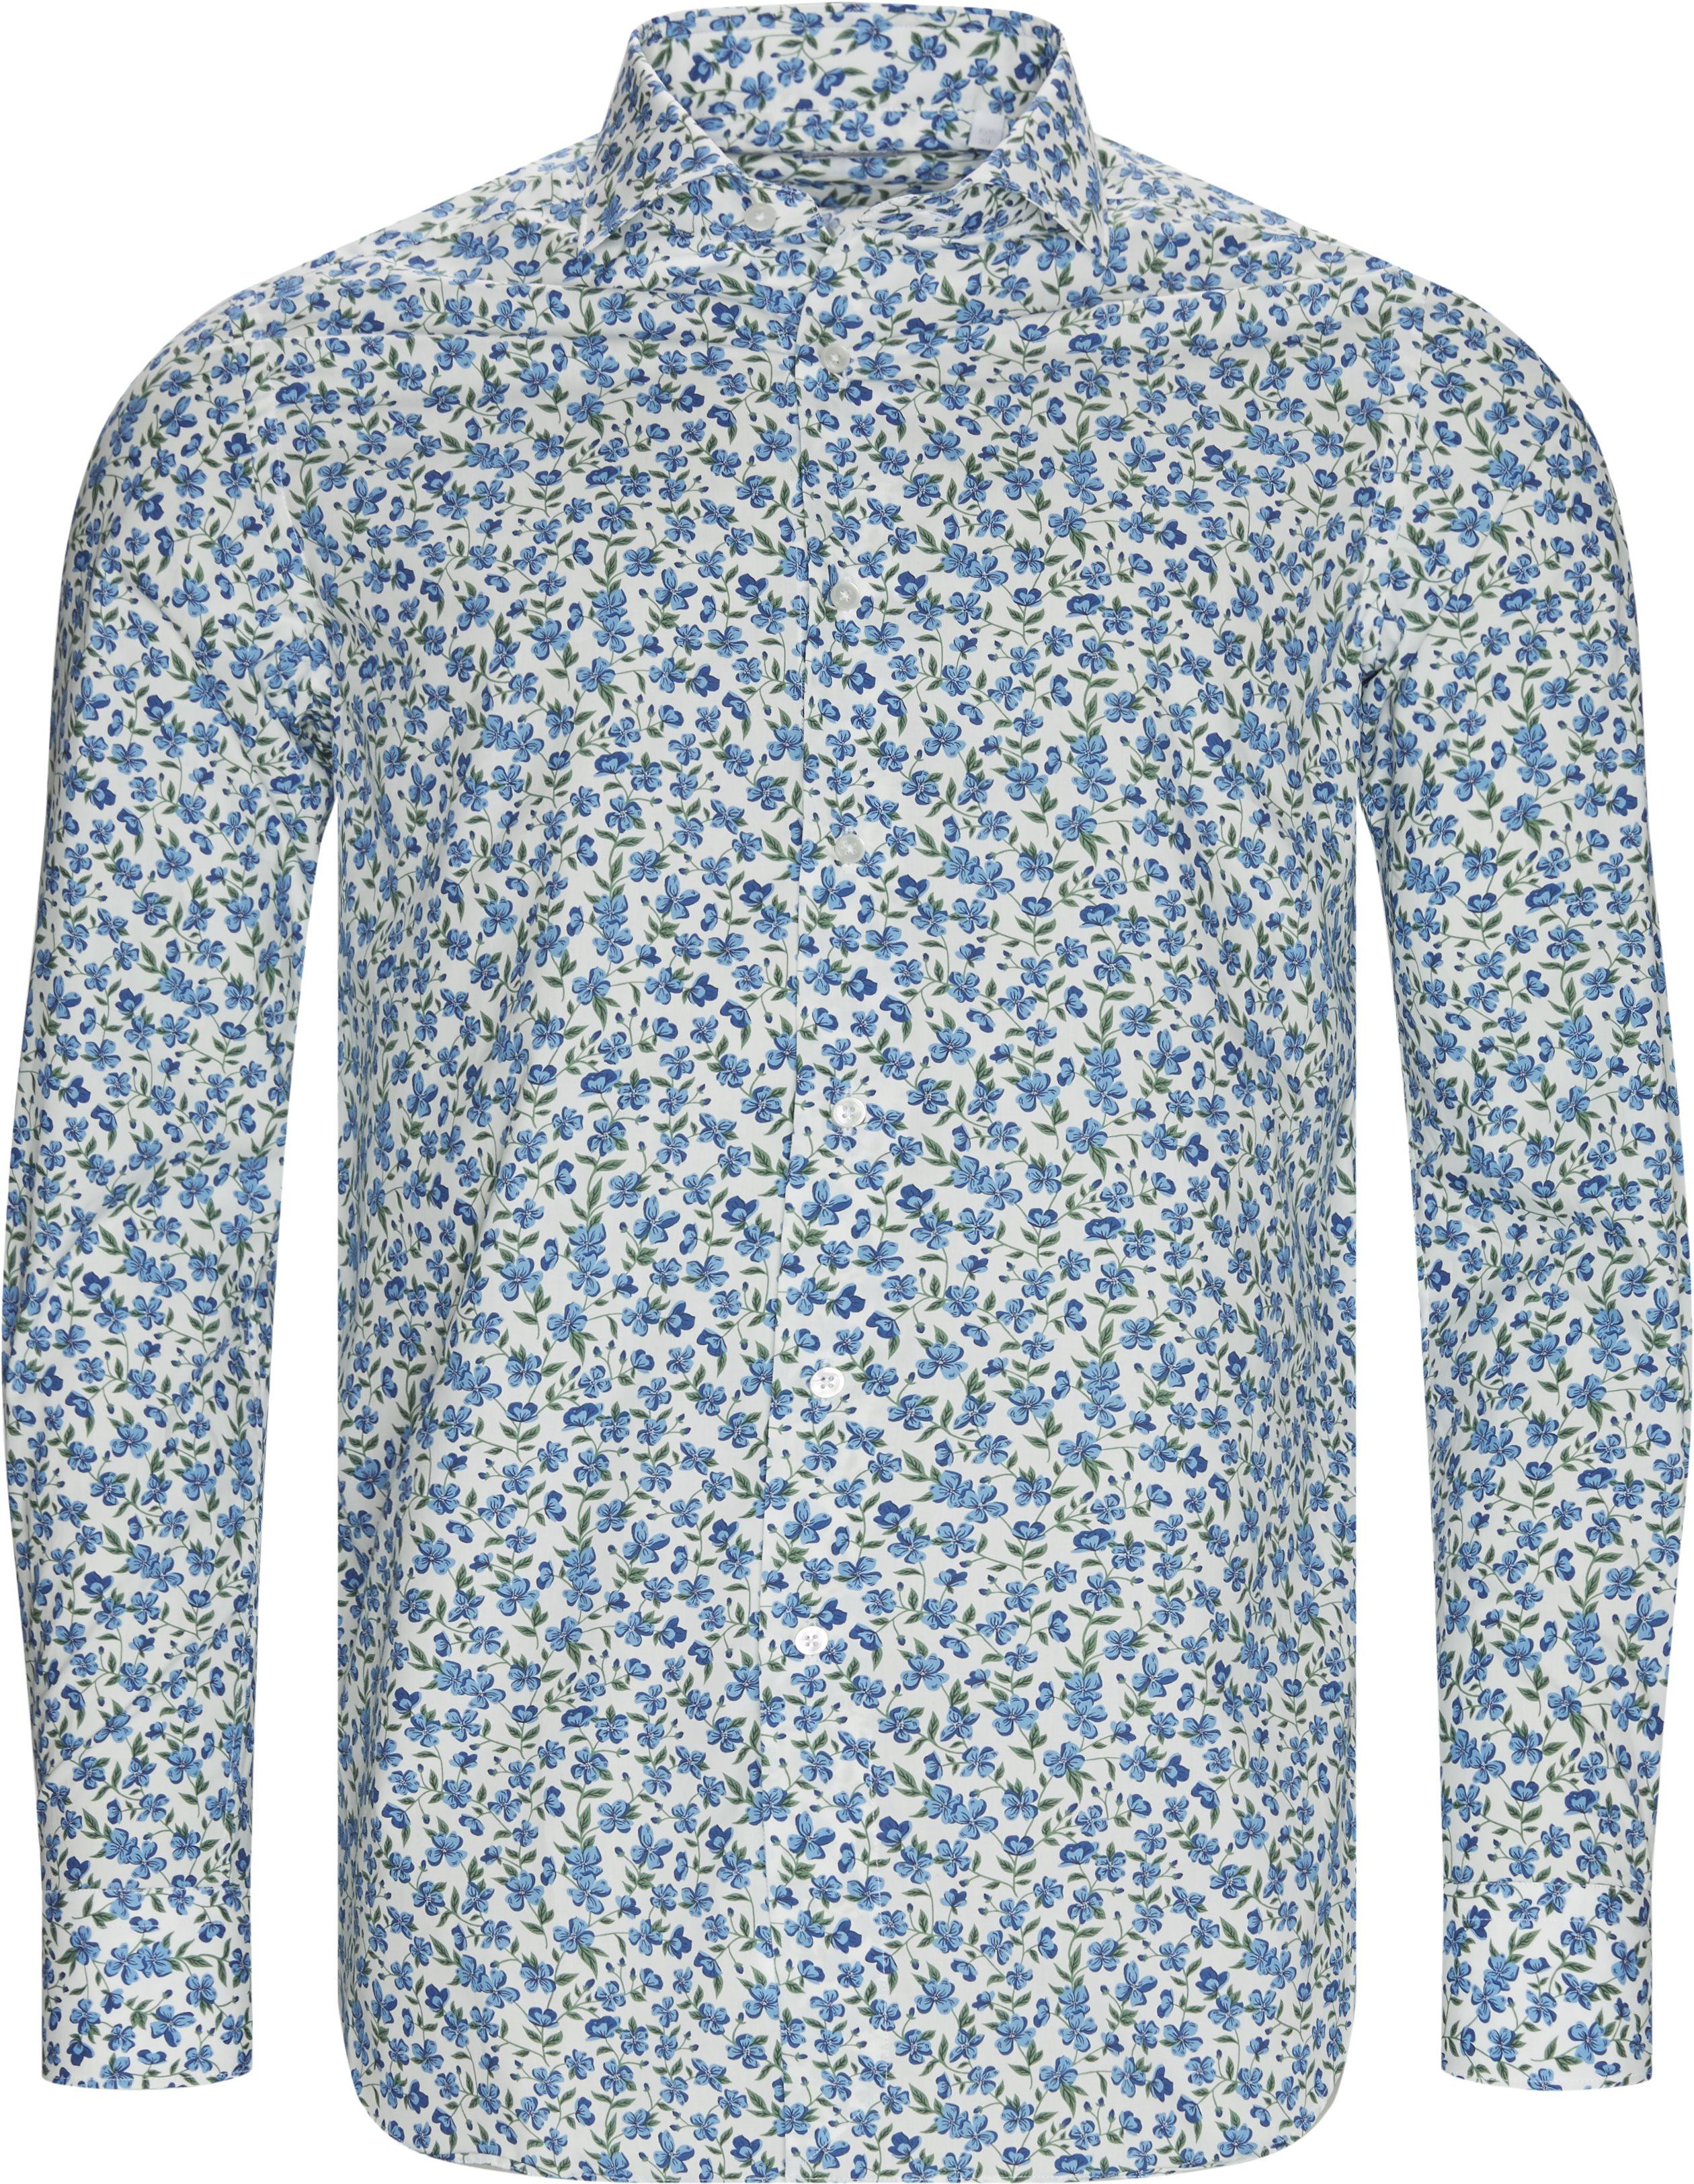 Skjorter - Contemporary fit - Multi